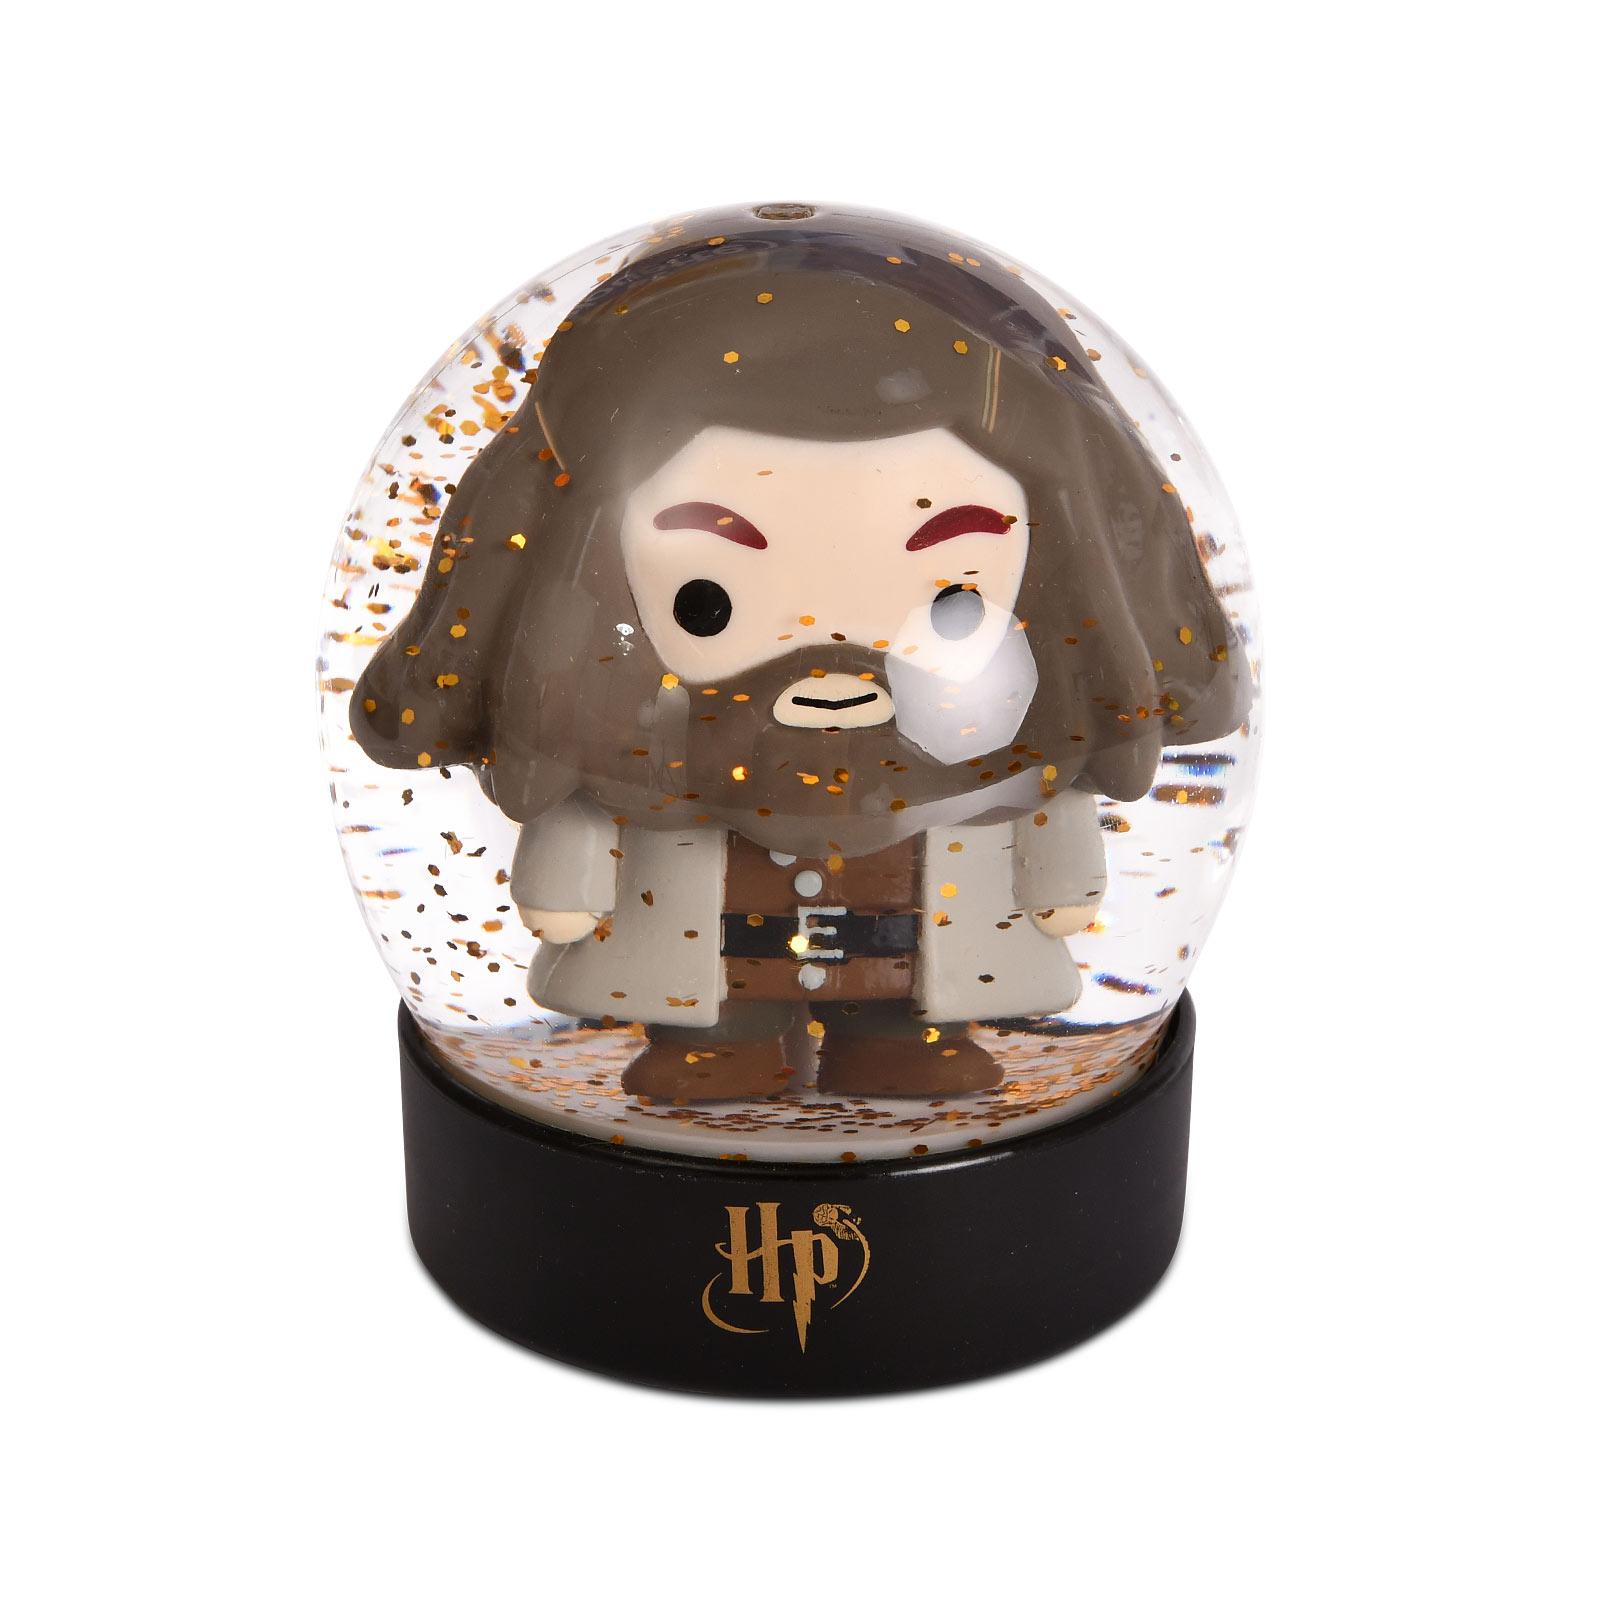 Harry Potter - Hagrid Chibi Schneekugel mit Glitter